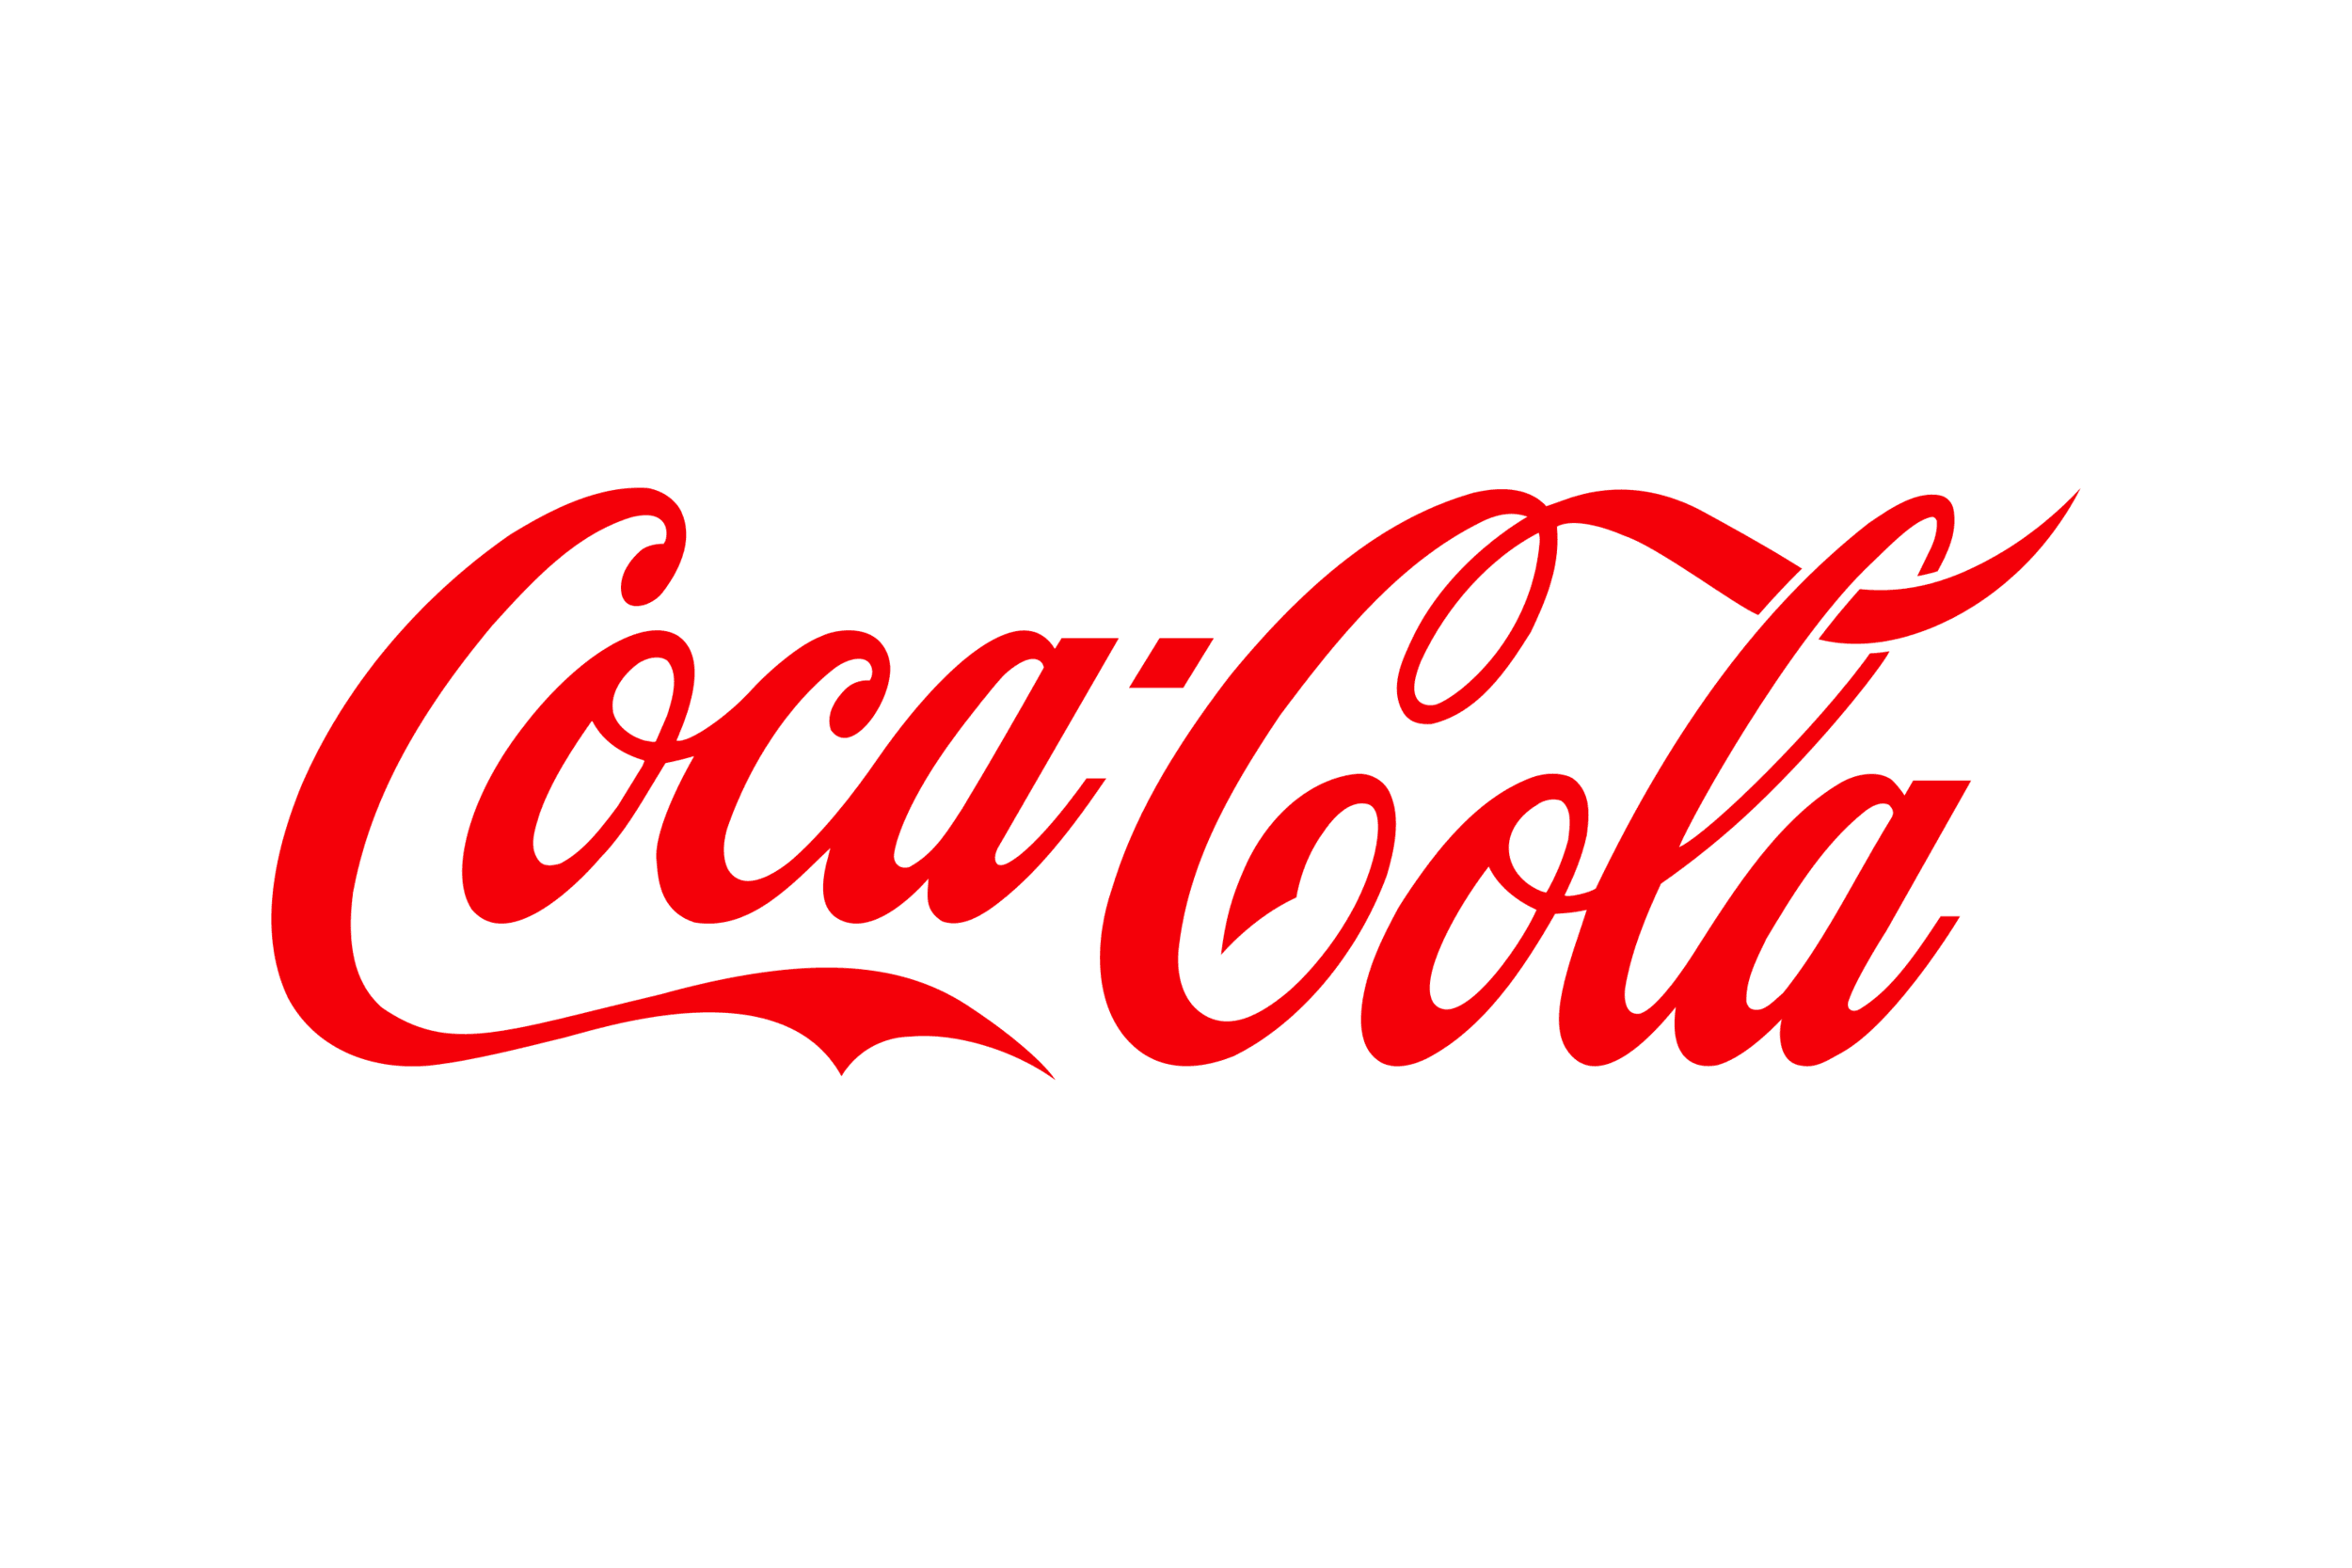 Coke thumbnail